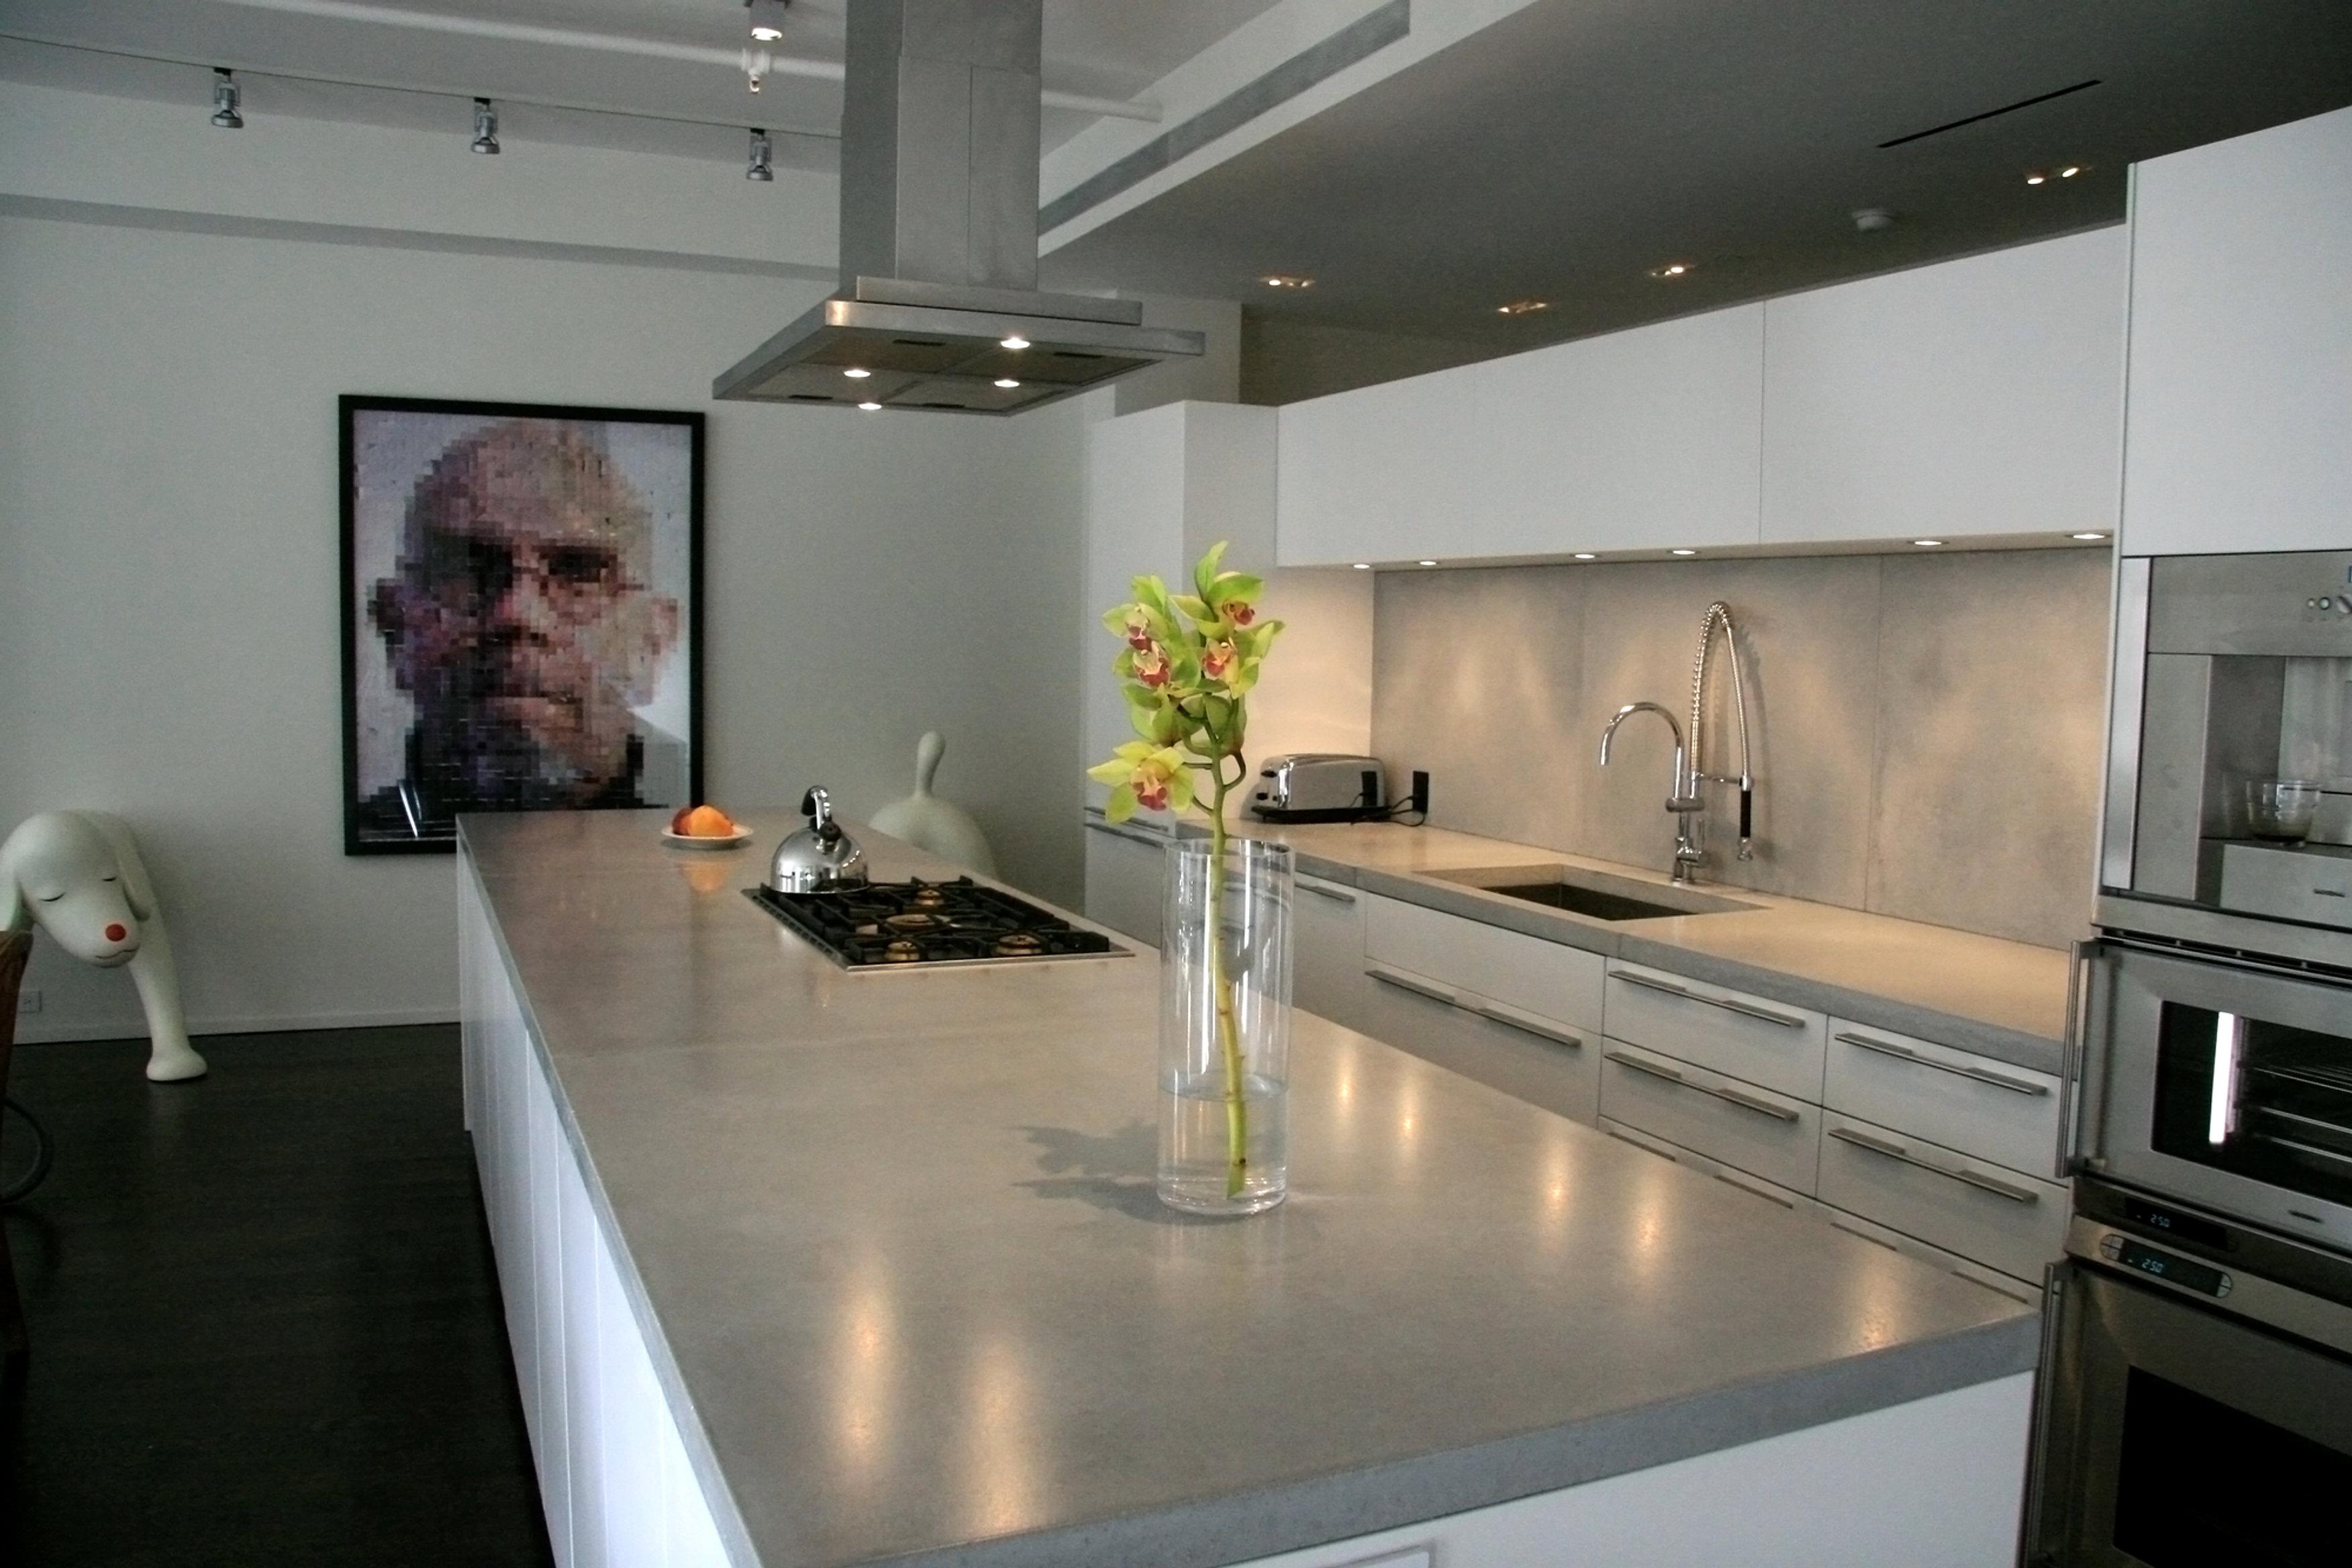 concreteshopstore concrete kitchen countertops Polished concrete countertops